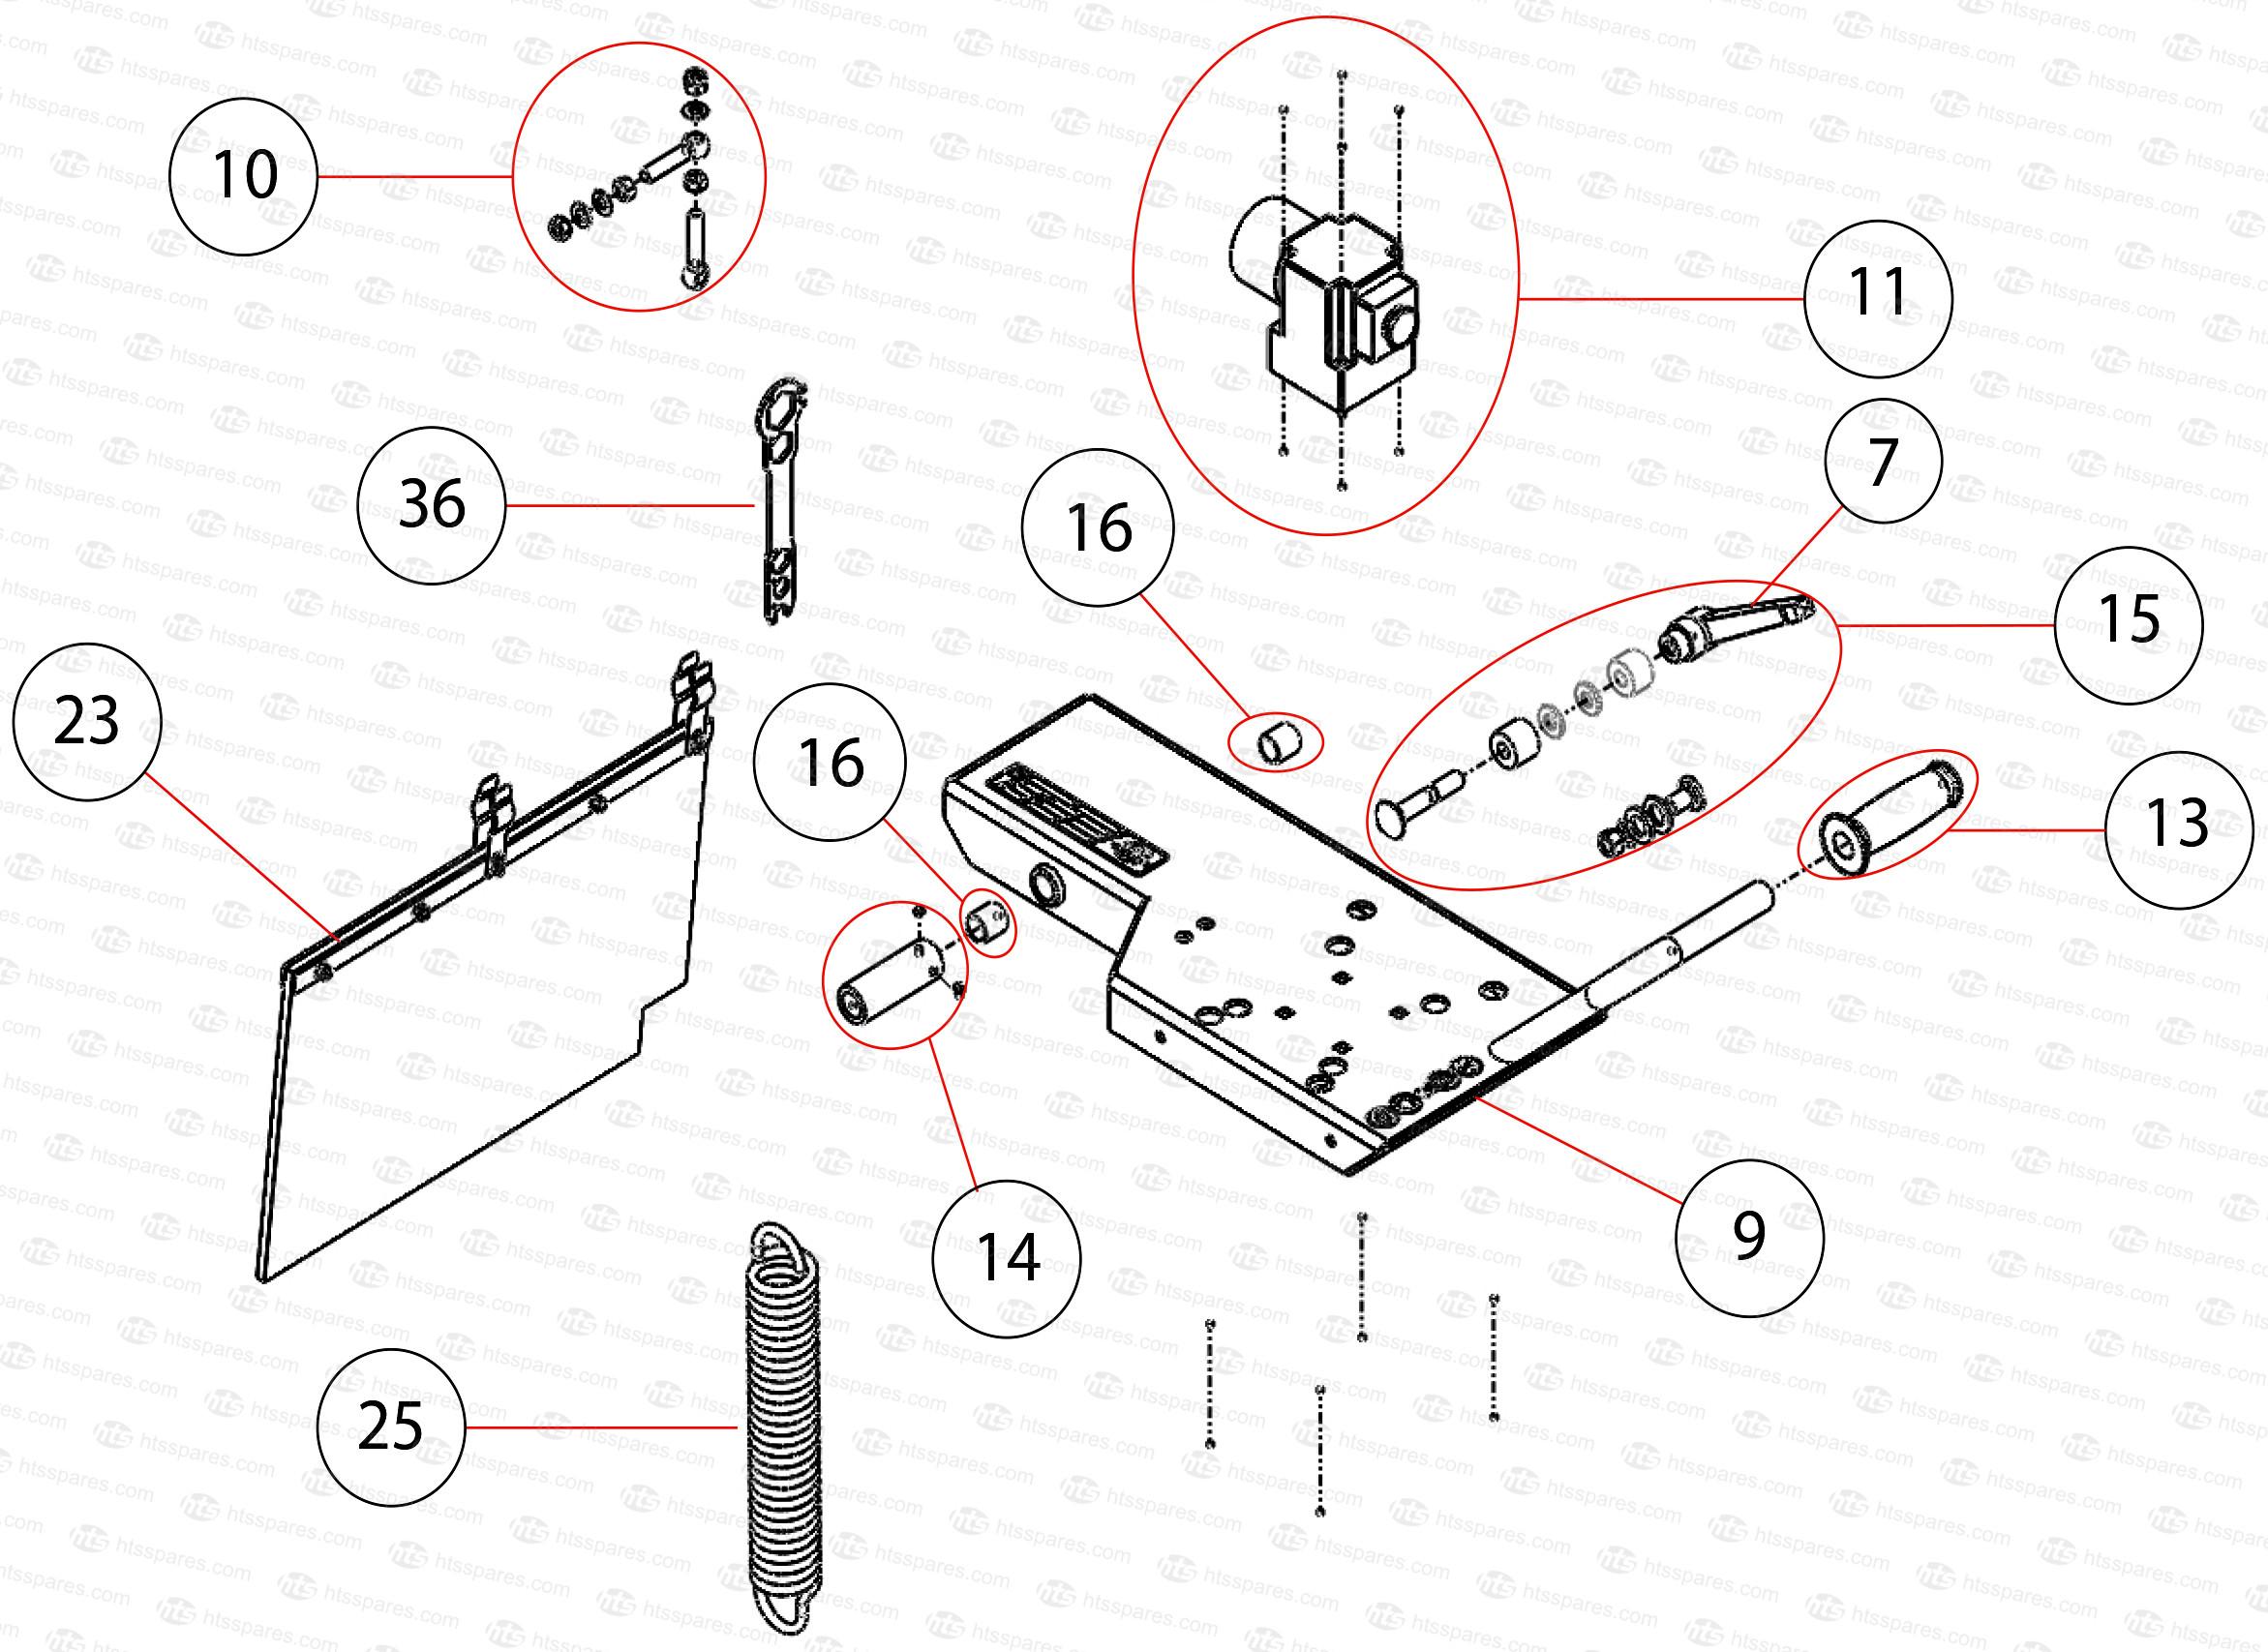 Norton Clipper Wiring Diagram - Block And Schematic Diagrams •